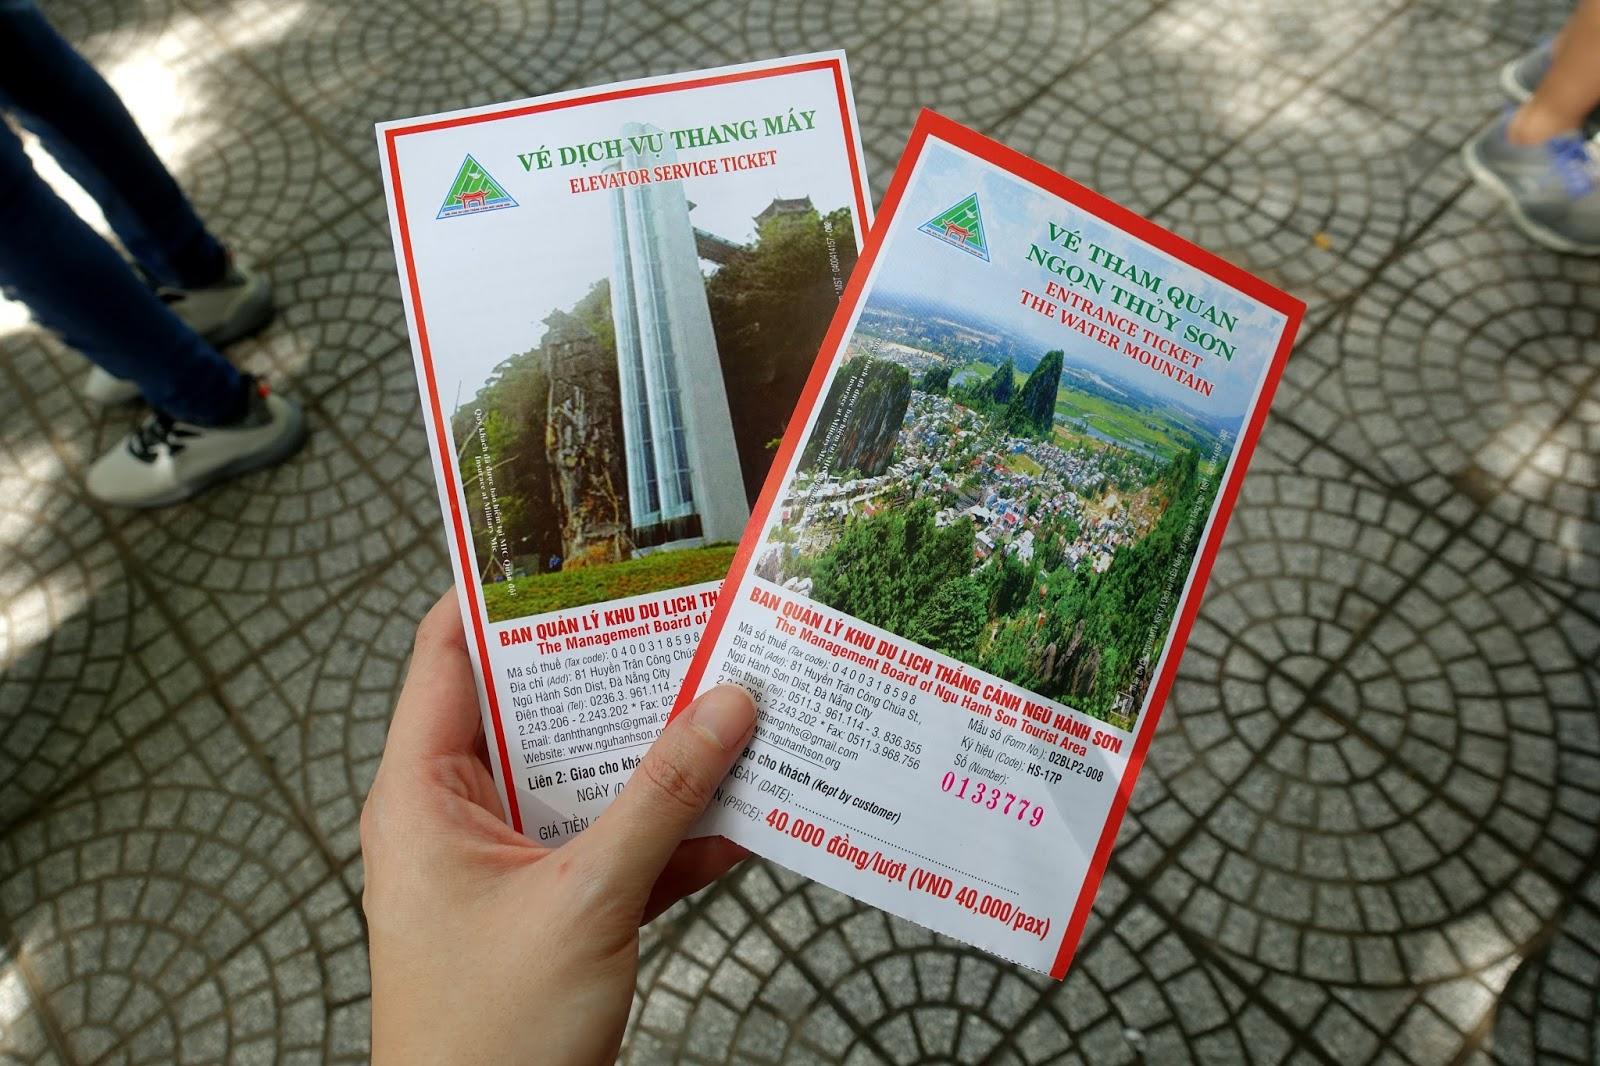 Marble Mountain entrance fee